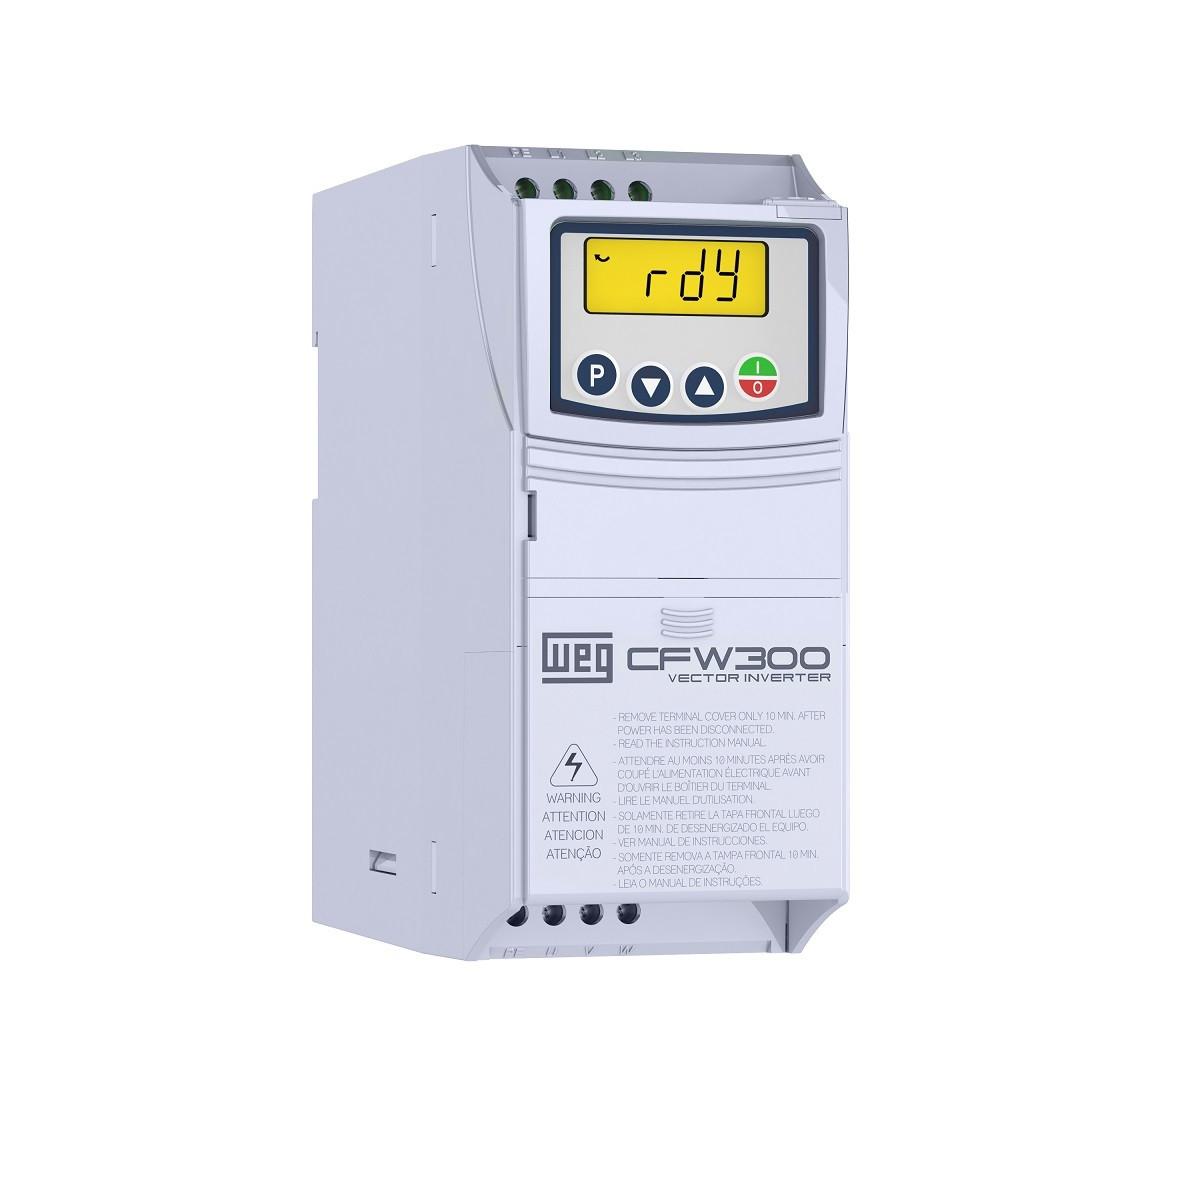 Перетворювач частоты CFW300 A 01P6 230V 1,6A 0,25kW